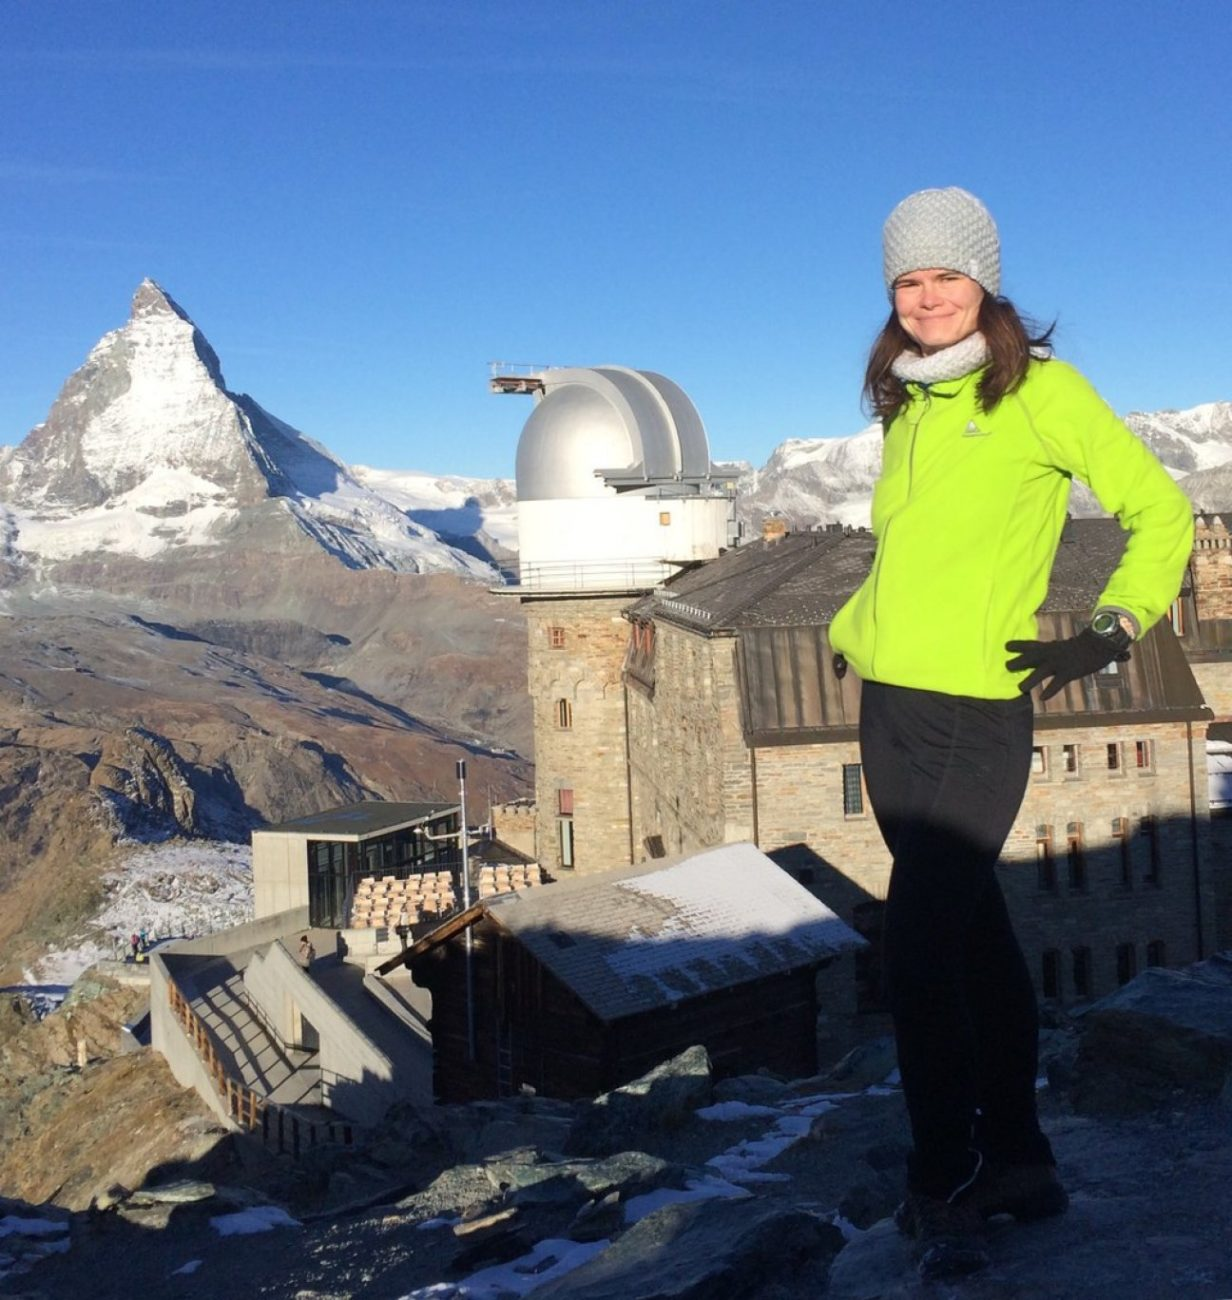 Девушка в горах у абсерватории